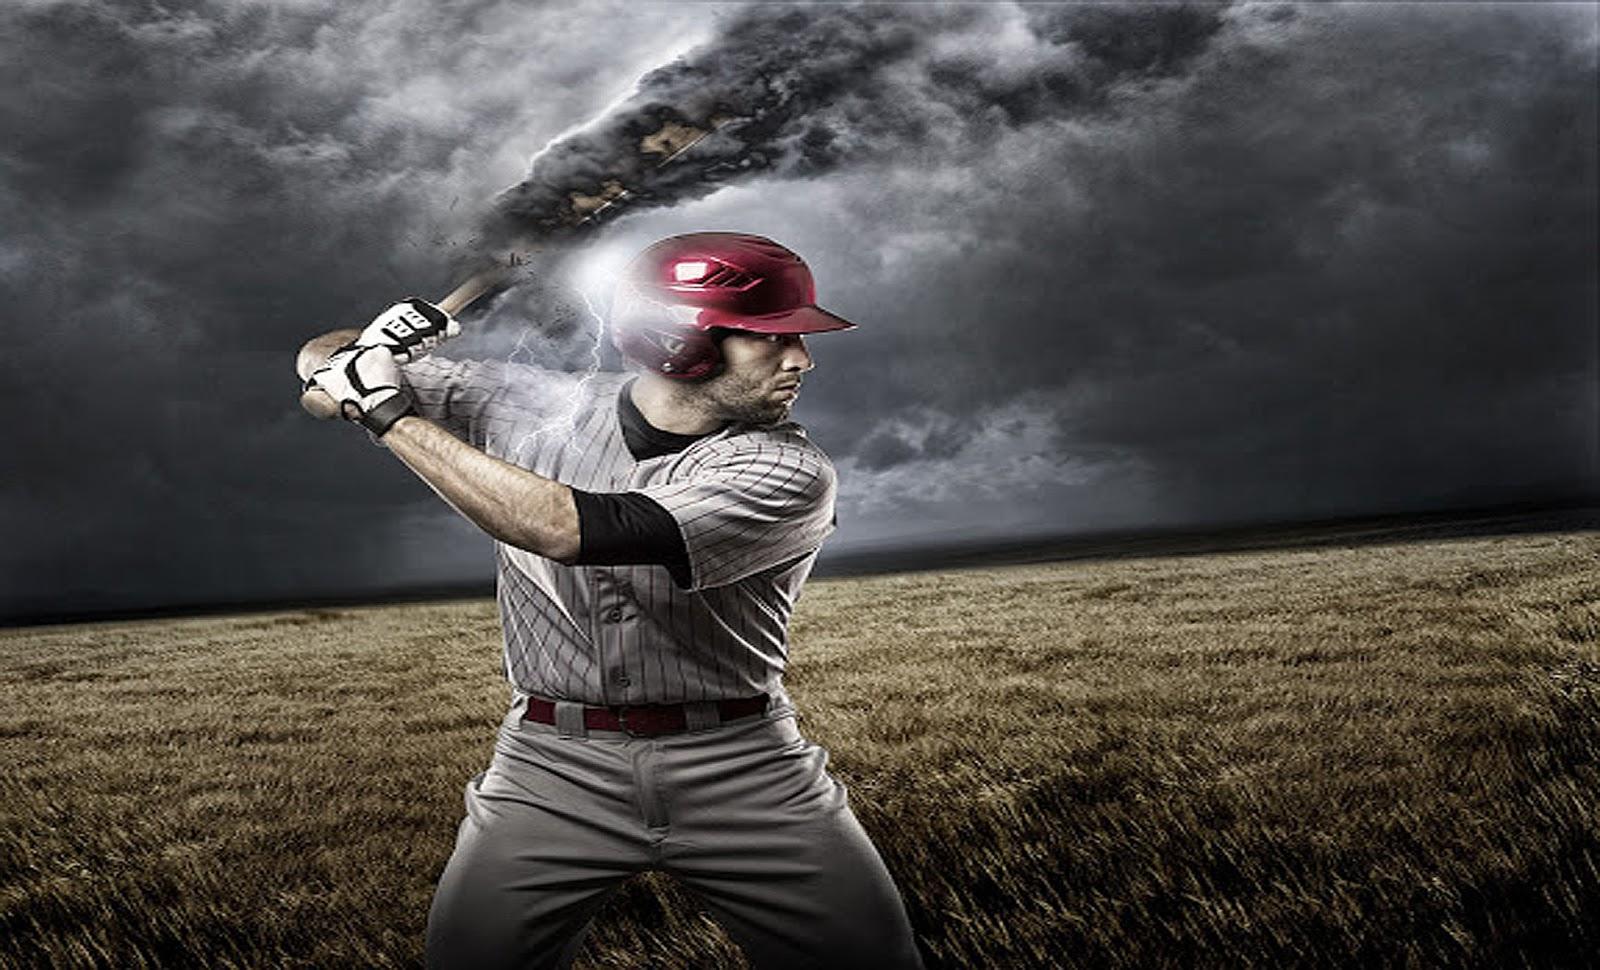 Baseball player wallpaper